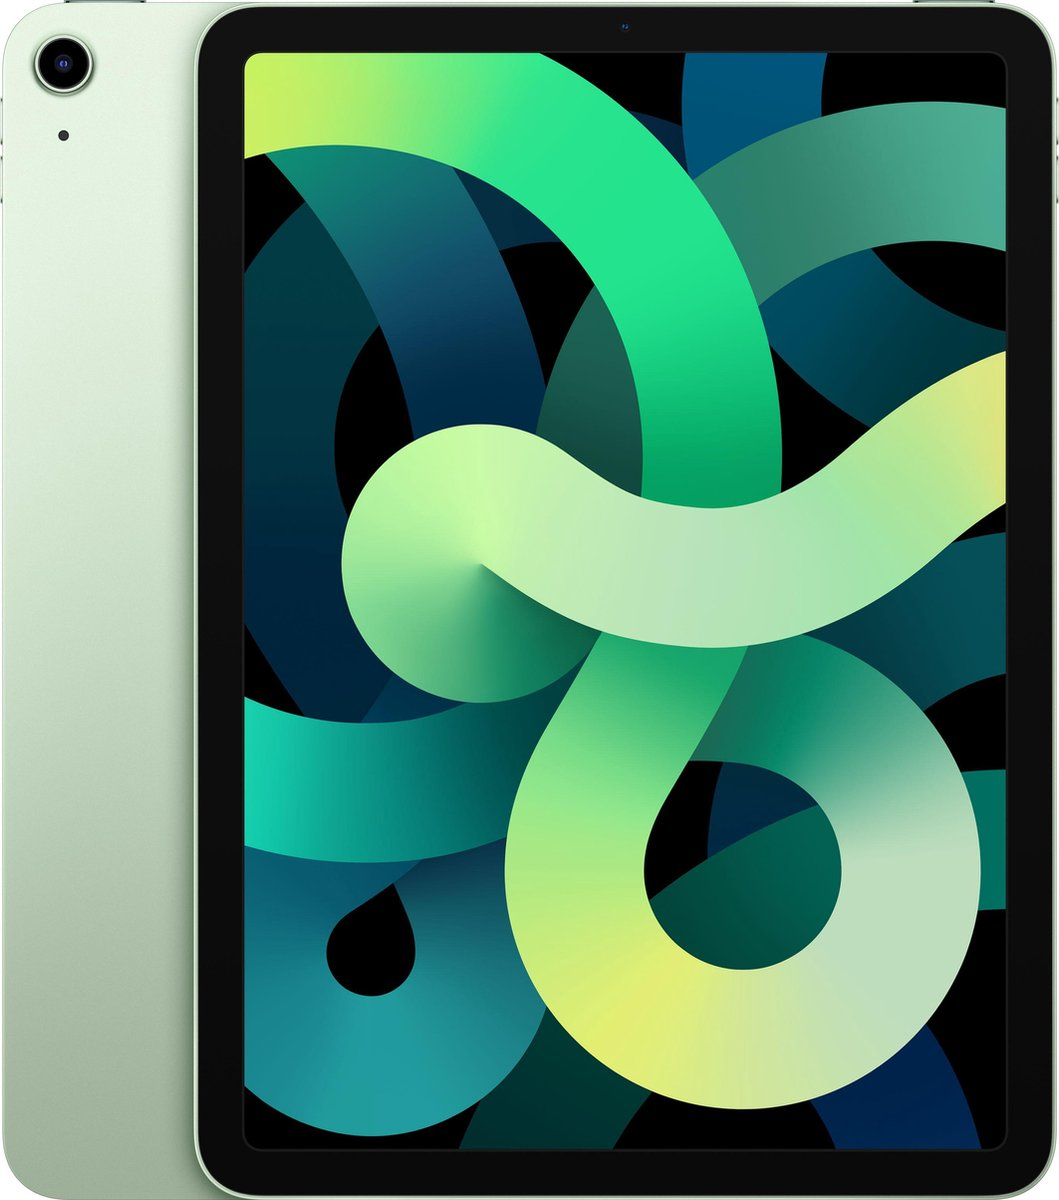 Apple iPad Air (2020) - 10.9 inch - WiFi - 256GB - Groen